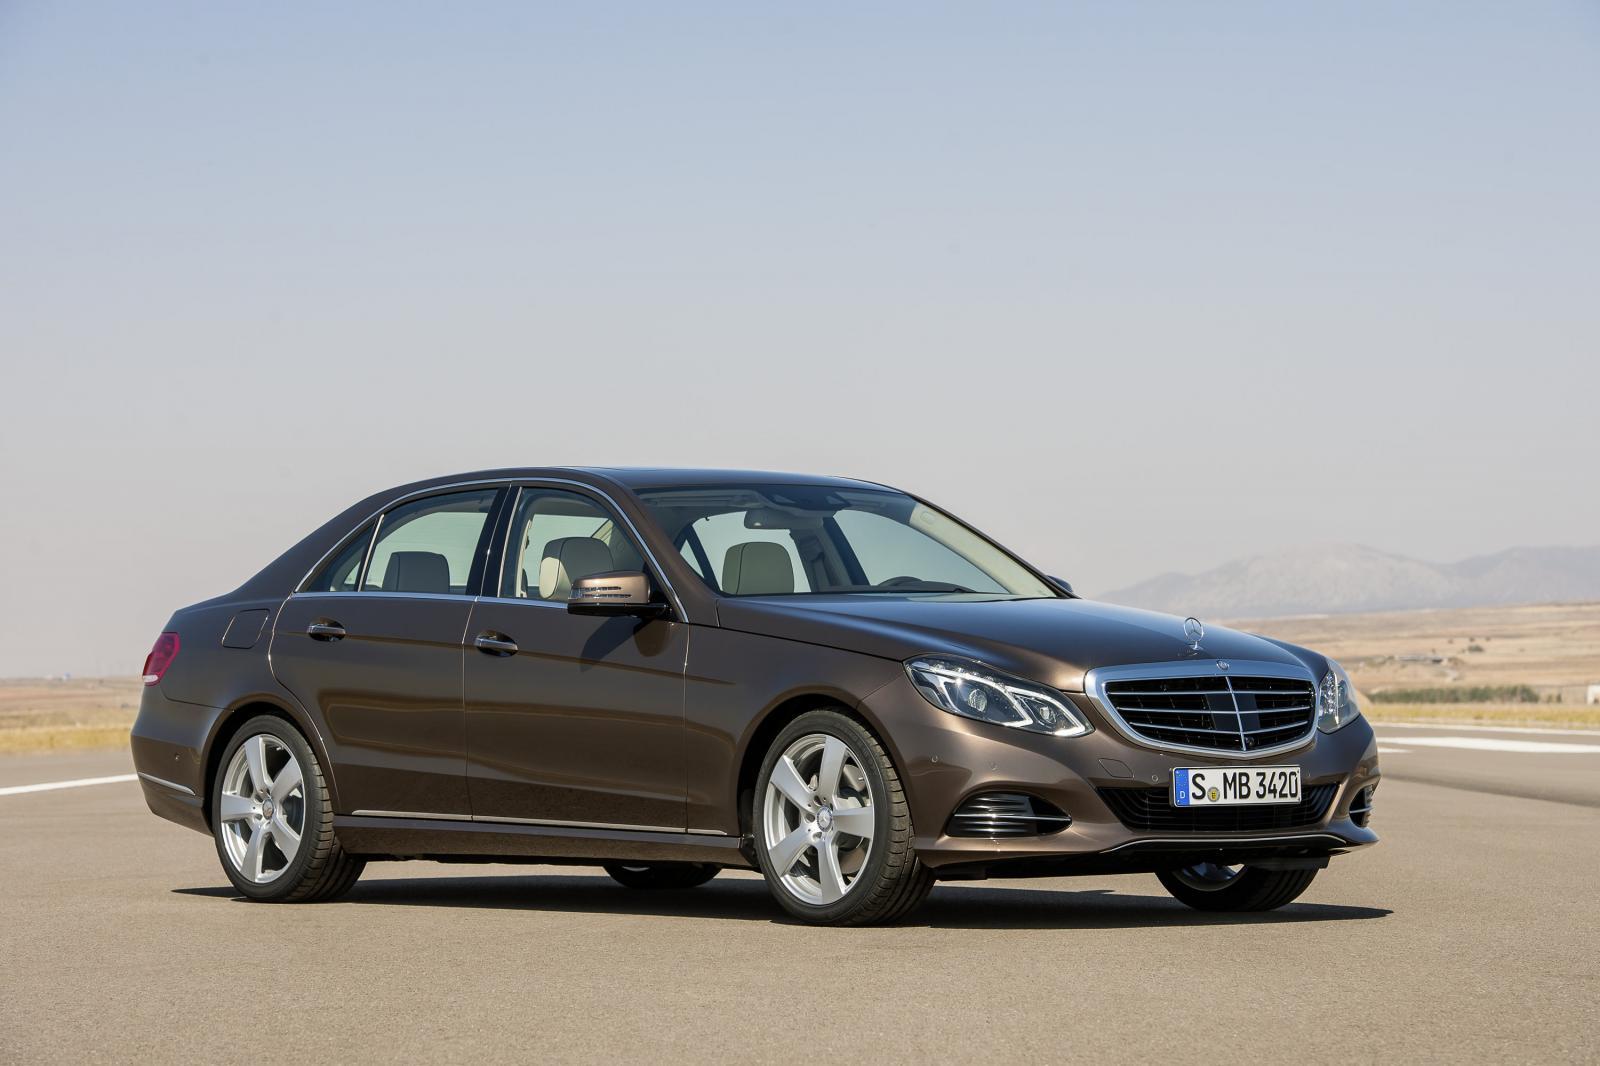 2014 mercedes-benz e-class facelift revealed - autoevolution